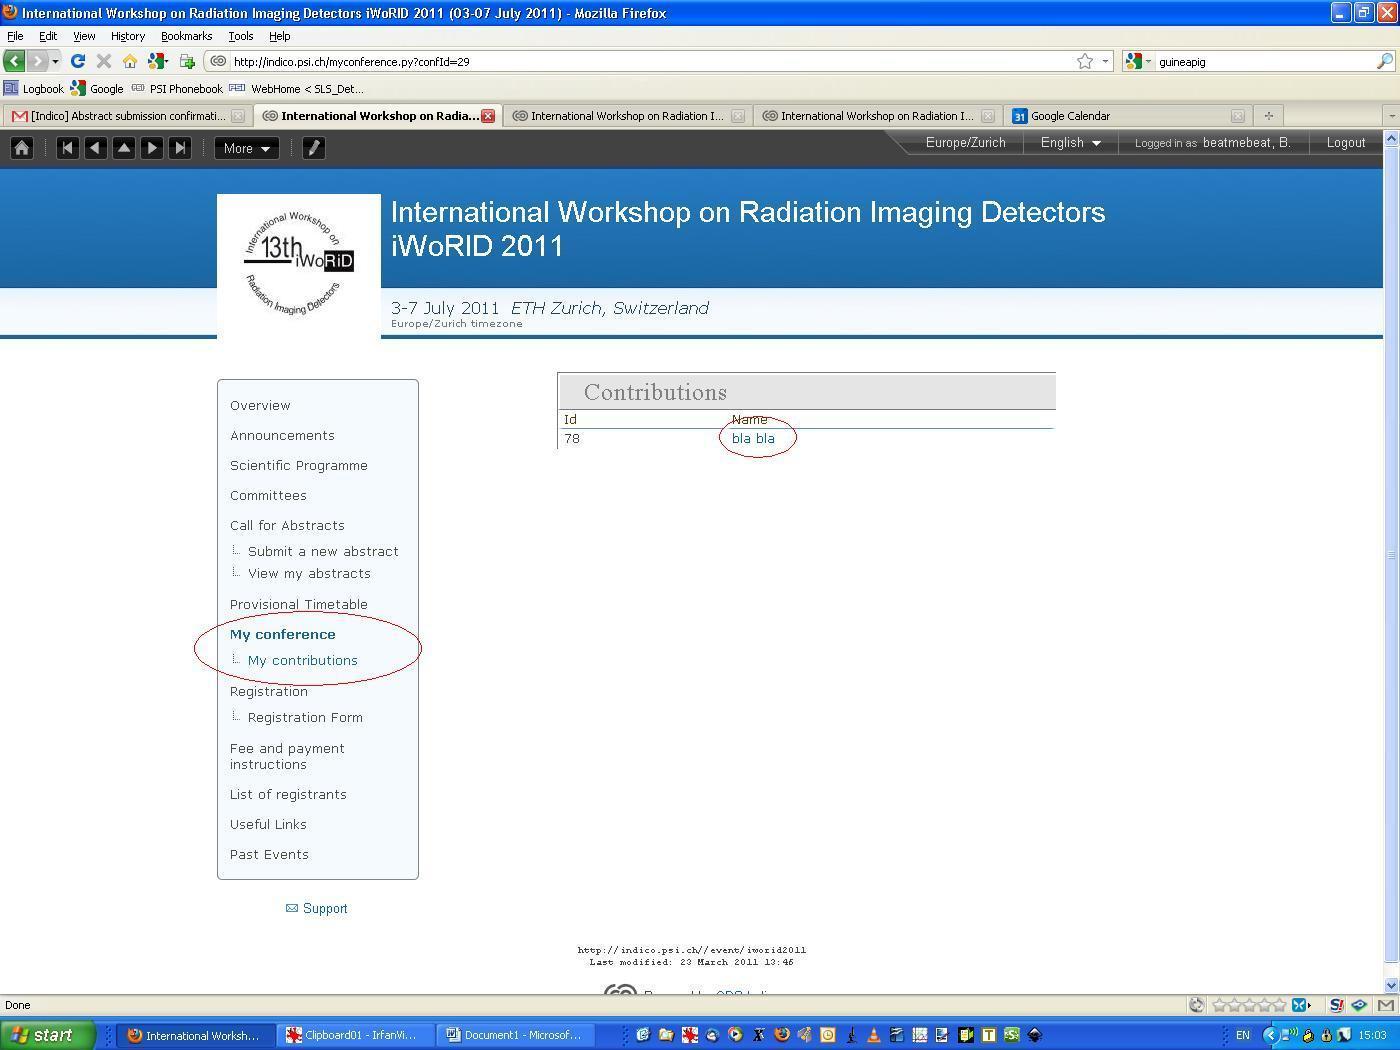 International Workshop on Radiation Imaging Detectors iWoRID 2011